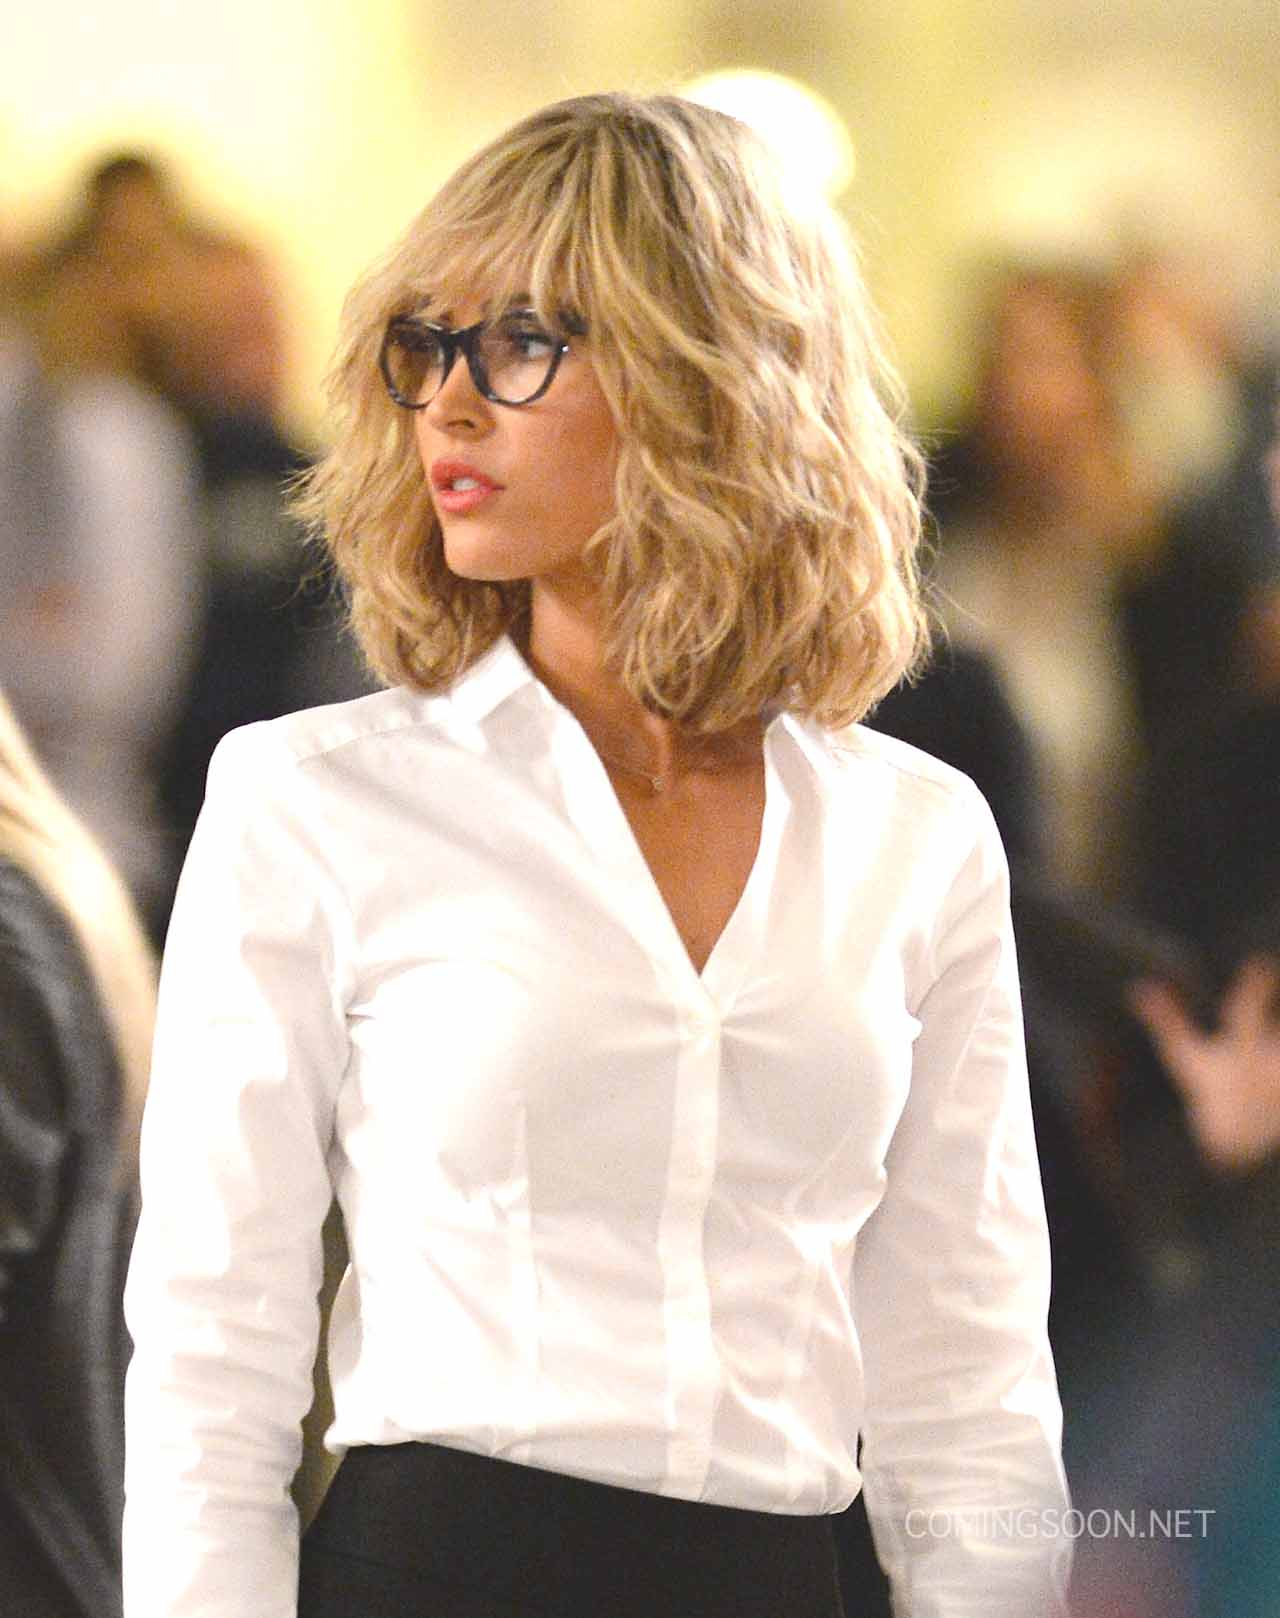 Celebrity Sightings In New York City - April 30, 2015